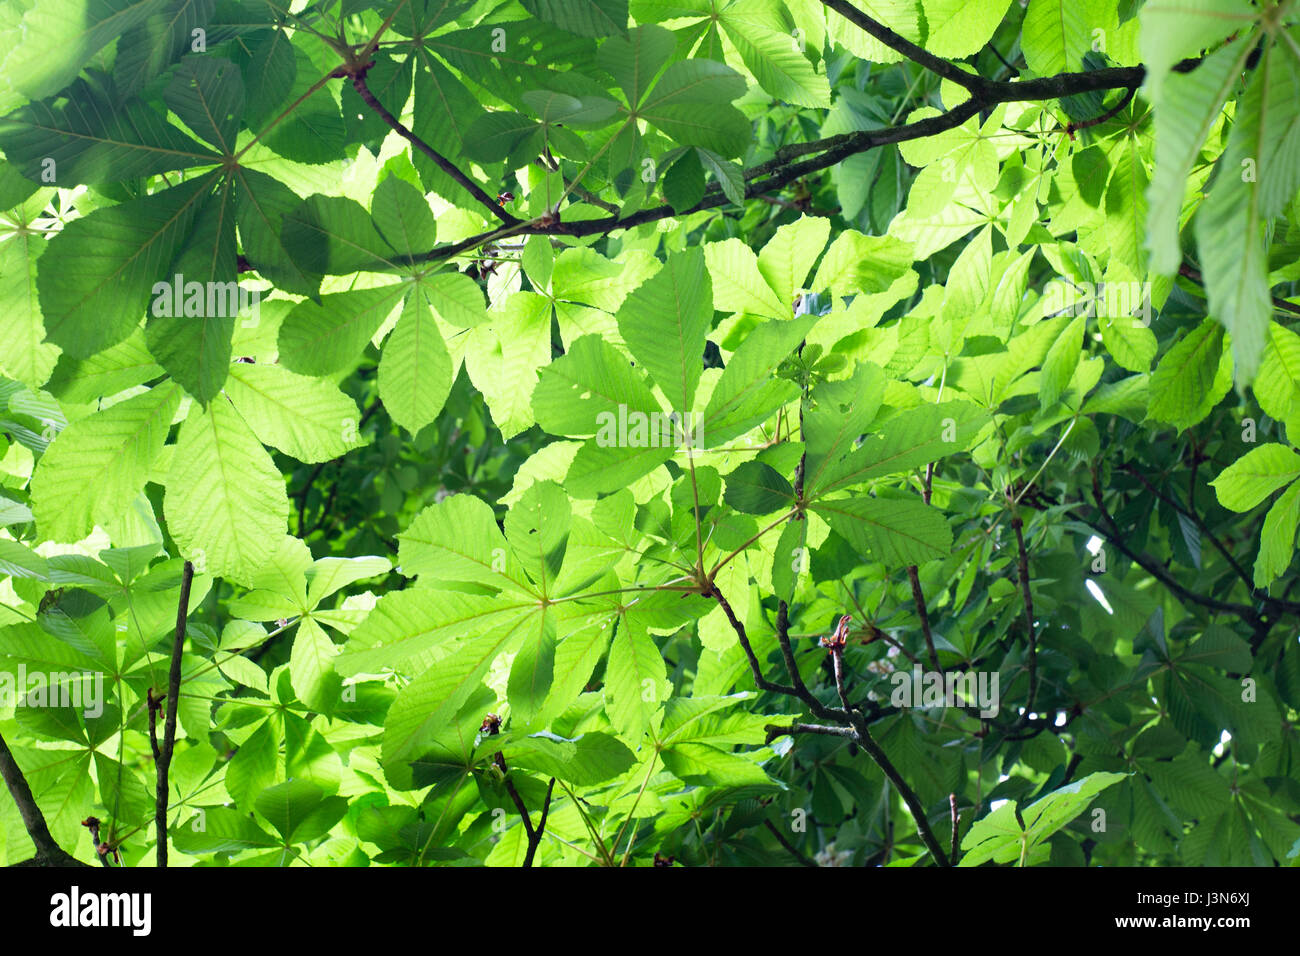 Bright green leaves on a tree on Hampstead Heath, London. - Stock Image